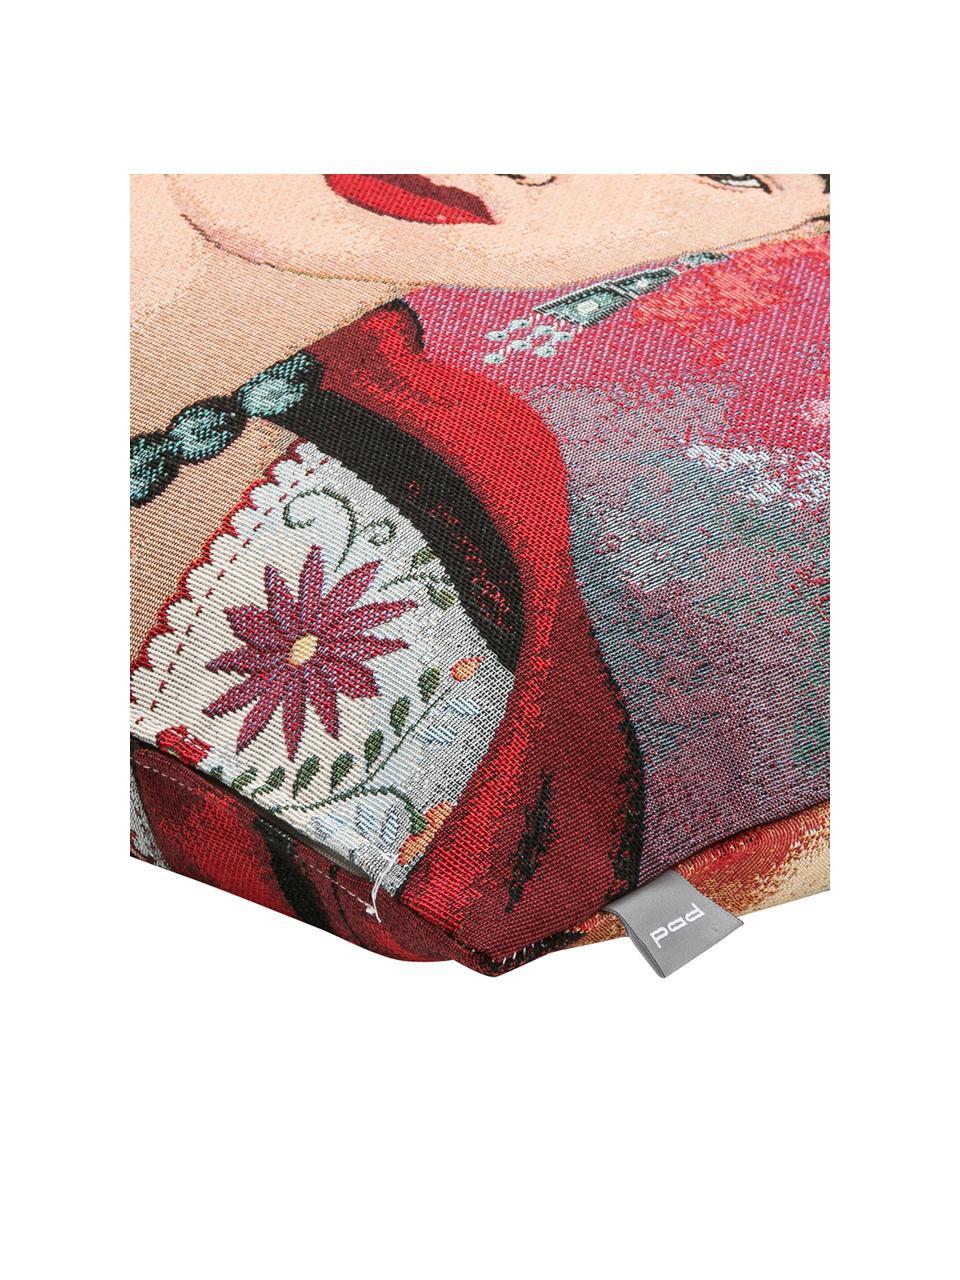 Kissenhülle Legend in Bunt, 50% Baumwolle, 45% Polyester, 5% Polyacrylnitril, Mehrfarbig, 45 x 45 cm